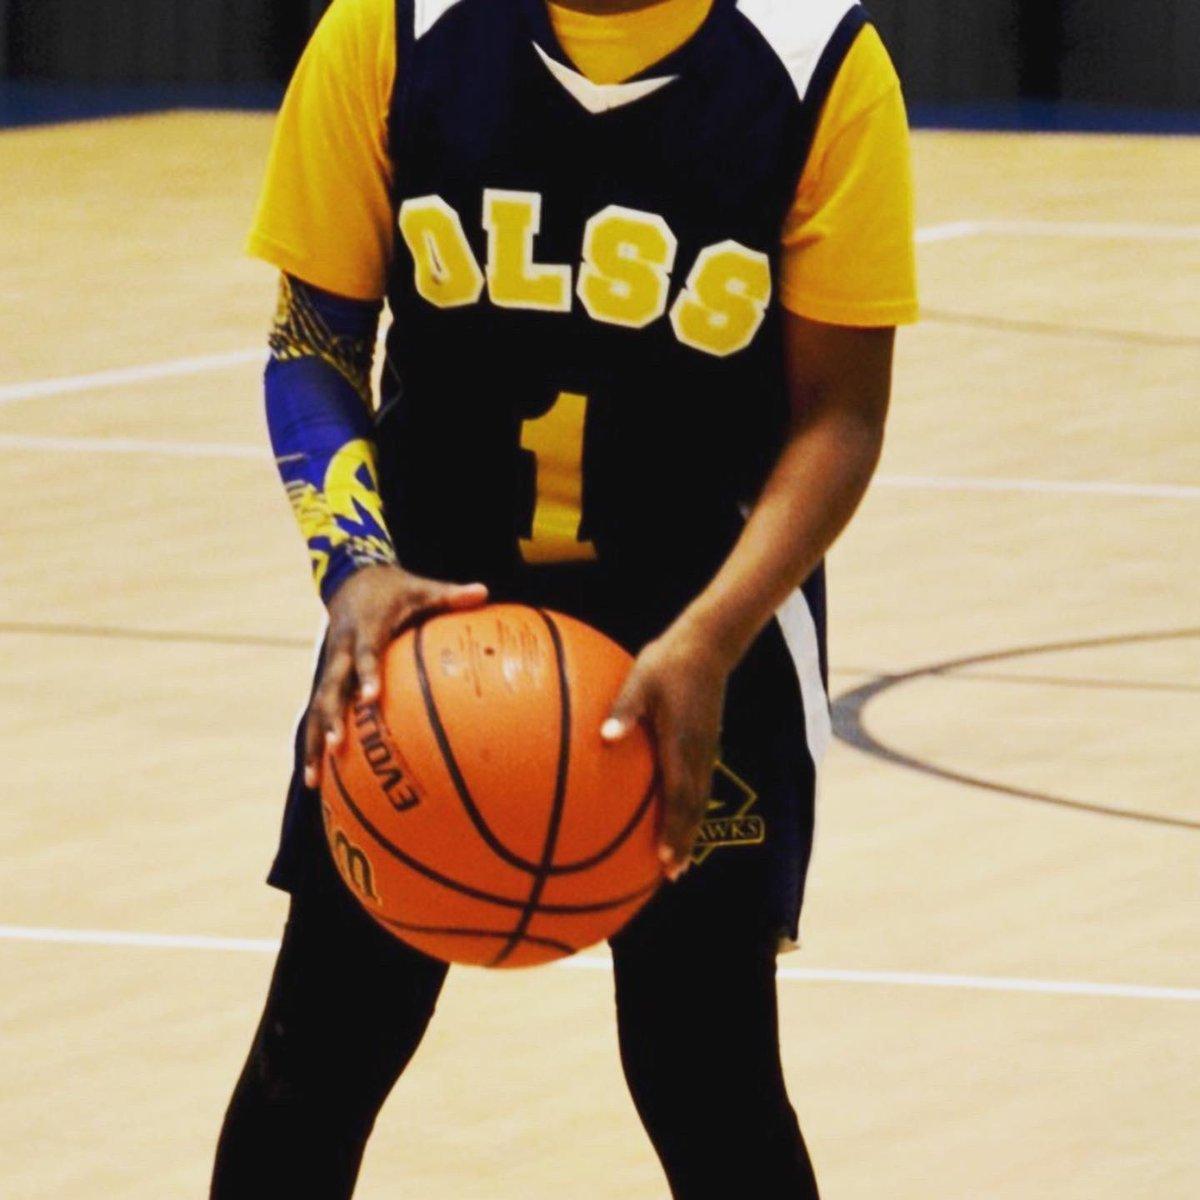 I miss hoopin wit my bro's #basketball pic.twitter.com/H0gtGsqM9Z